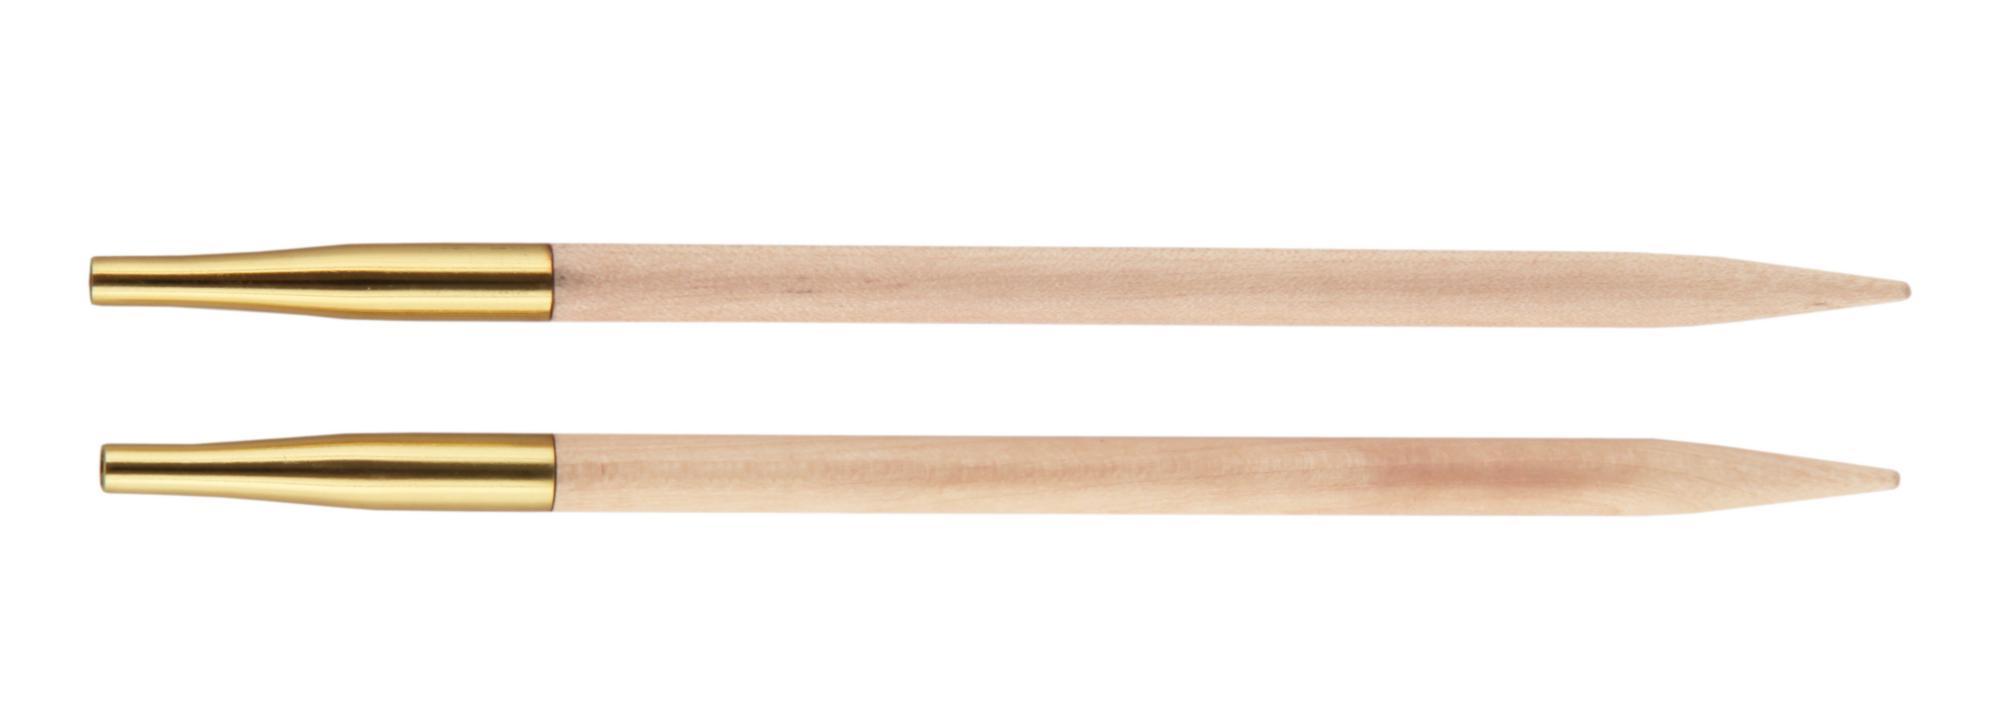 Спицы съемные Basix Birch Wood KnitPro, 35631, 3.00 мм